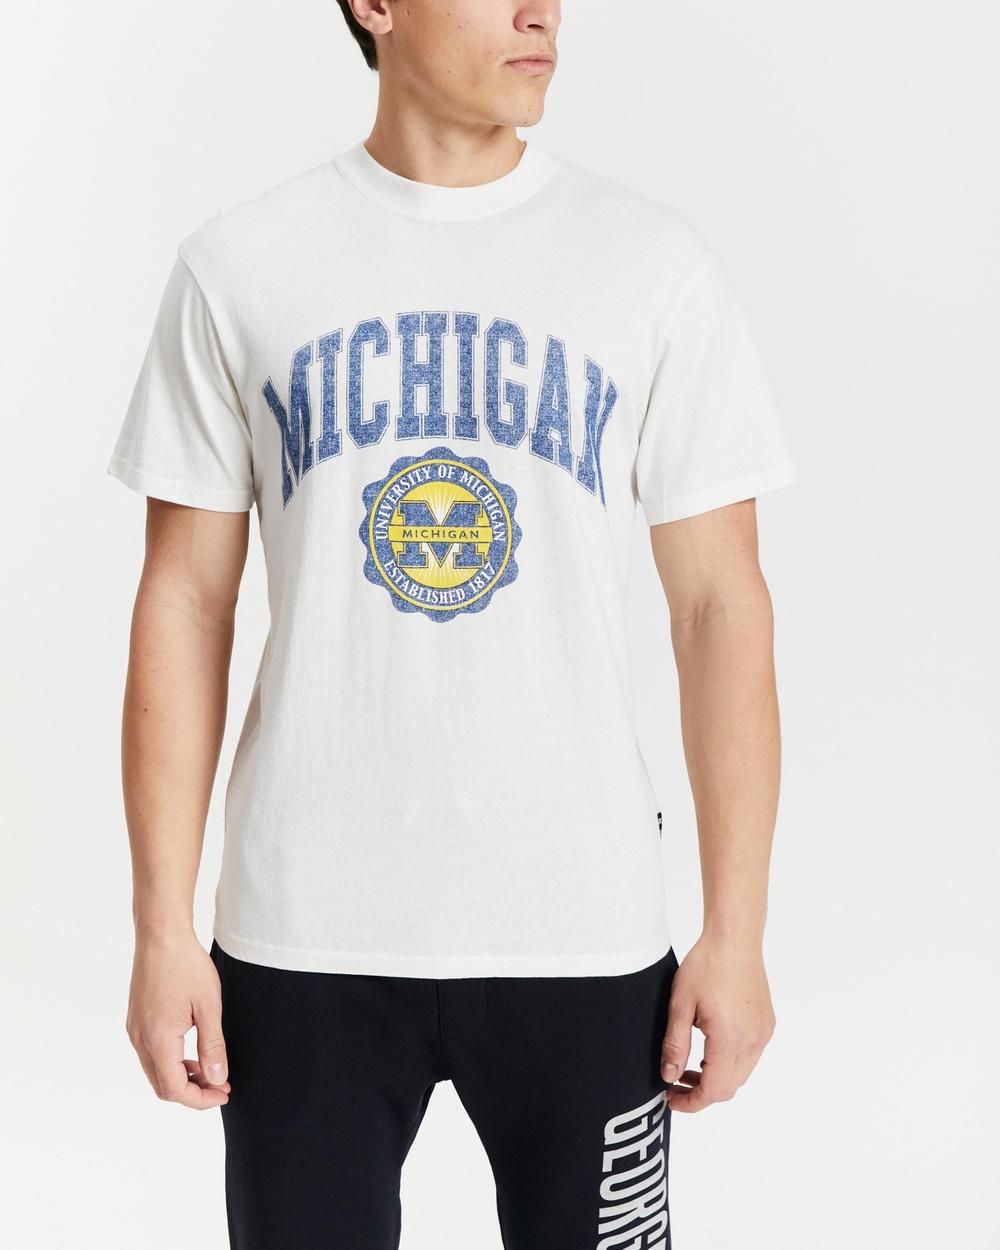 NCAA College Seal Tee Short Sleeve T-Shirts Michigan & Vintage White Australia